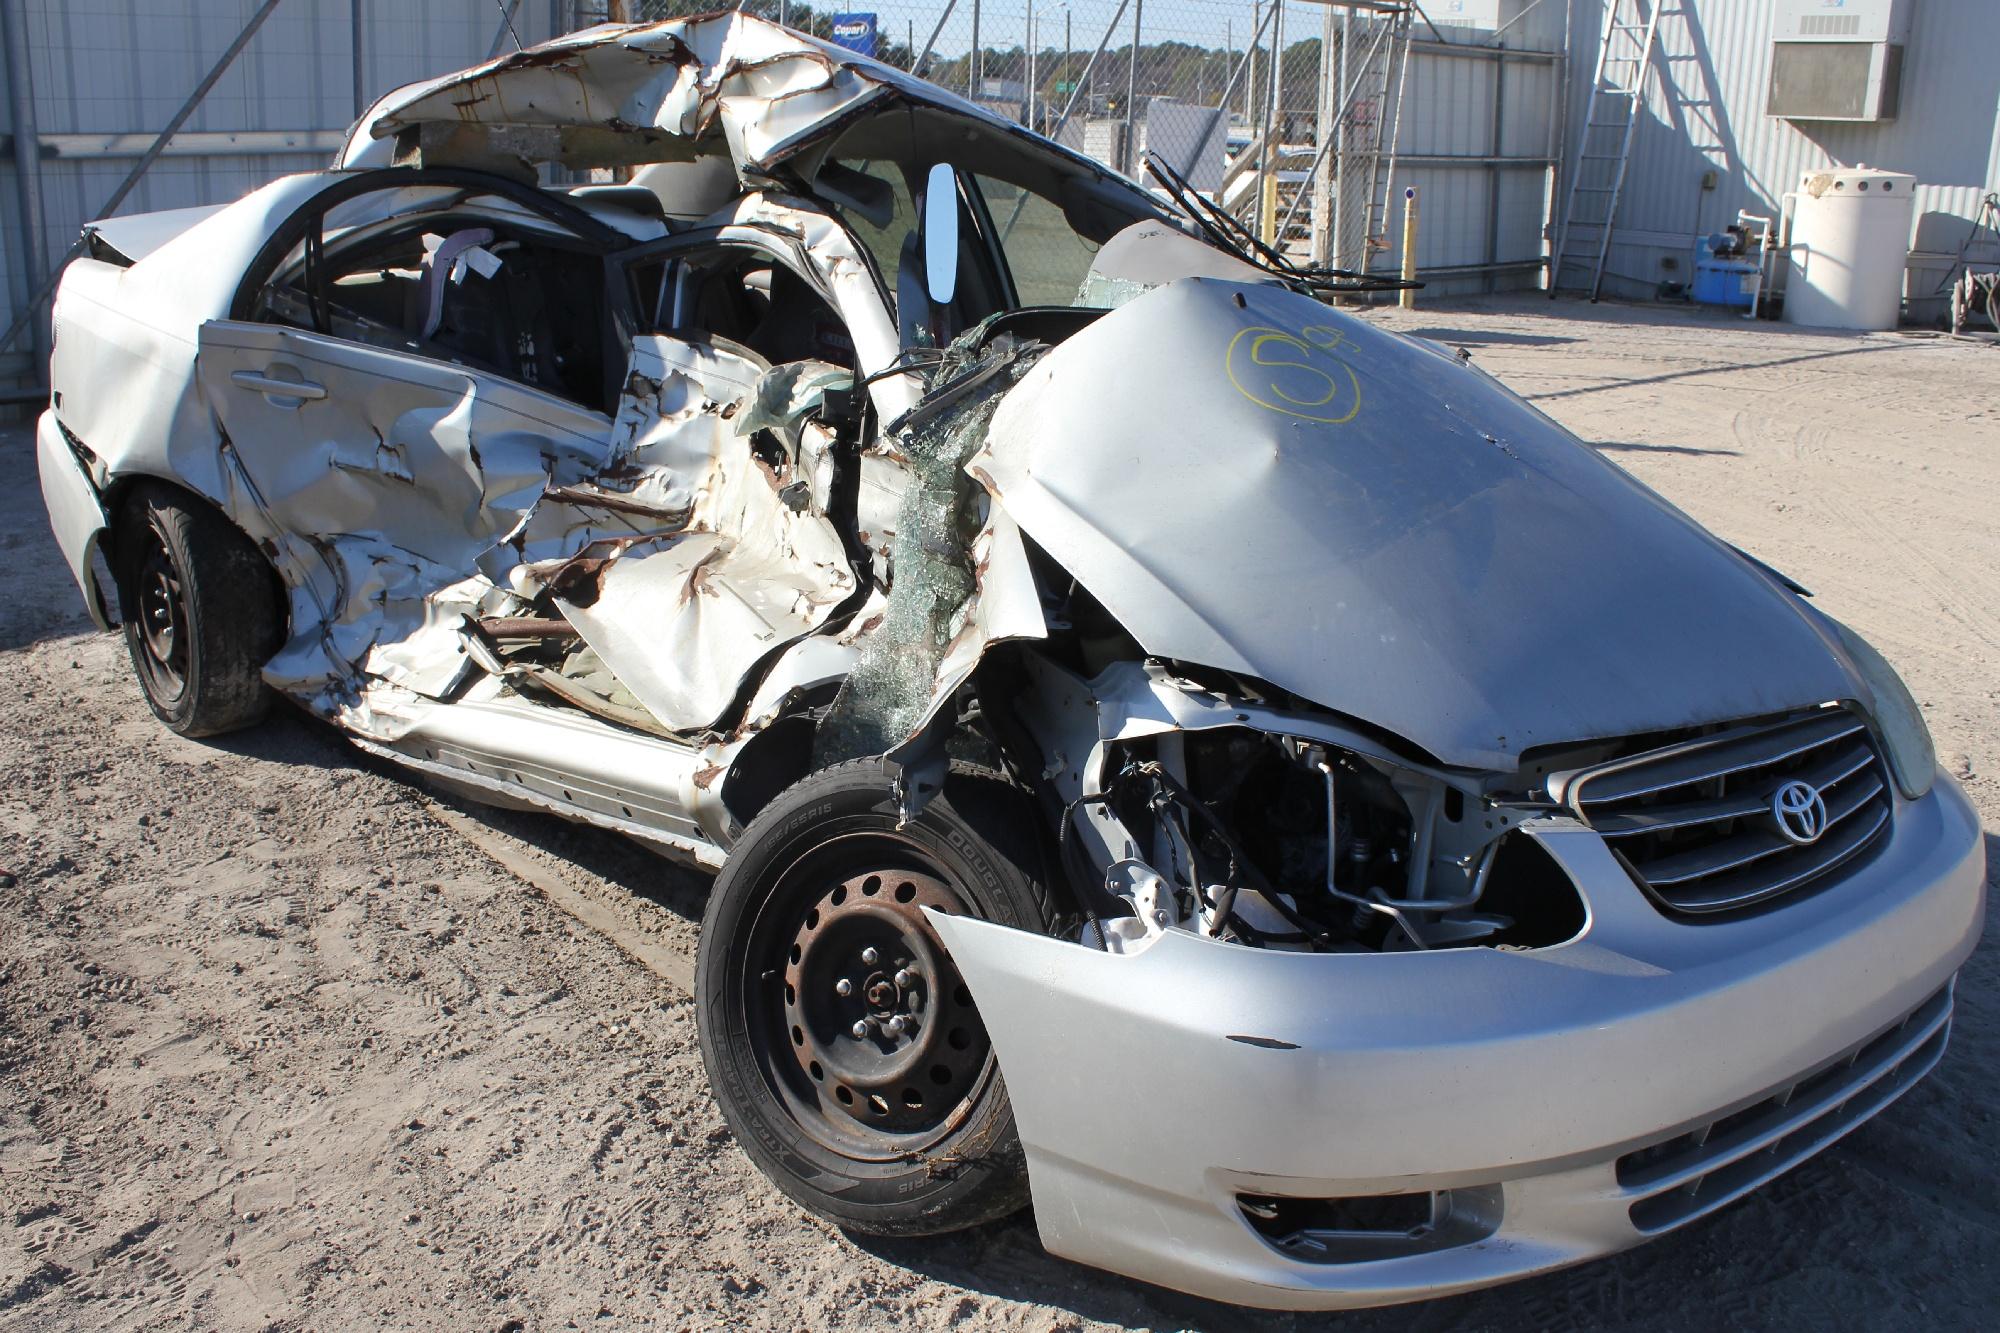 Car Accidents In Jacksonville Fl Last Night